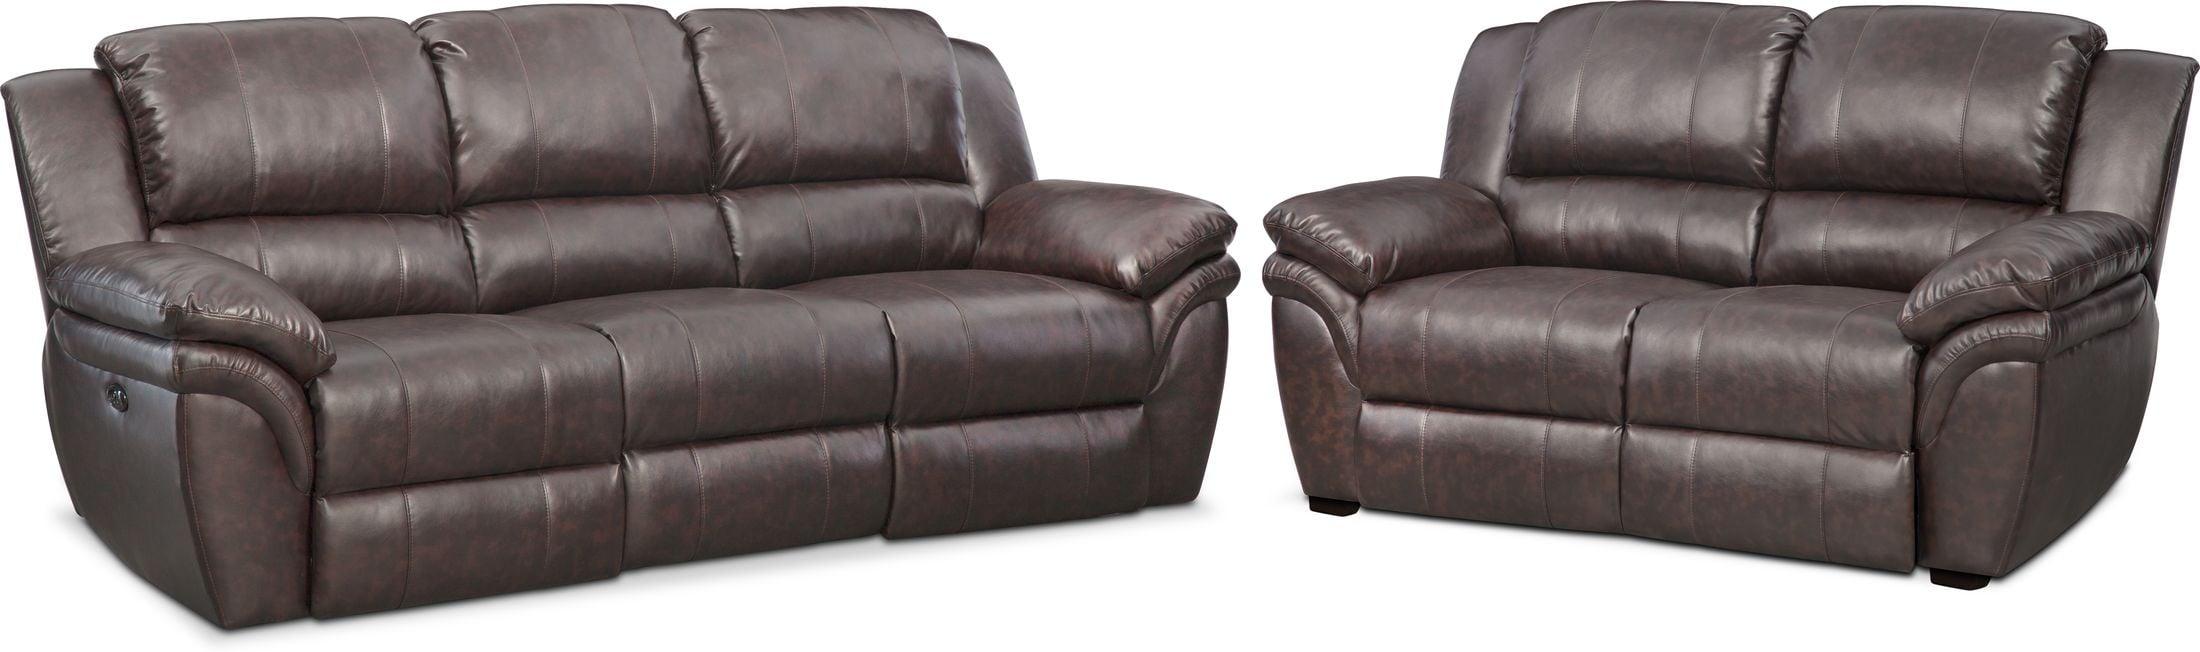 Living Room Furniture - Aldo Power Reclining Sofa and Stationary Loveseat Set